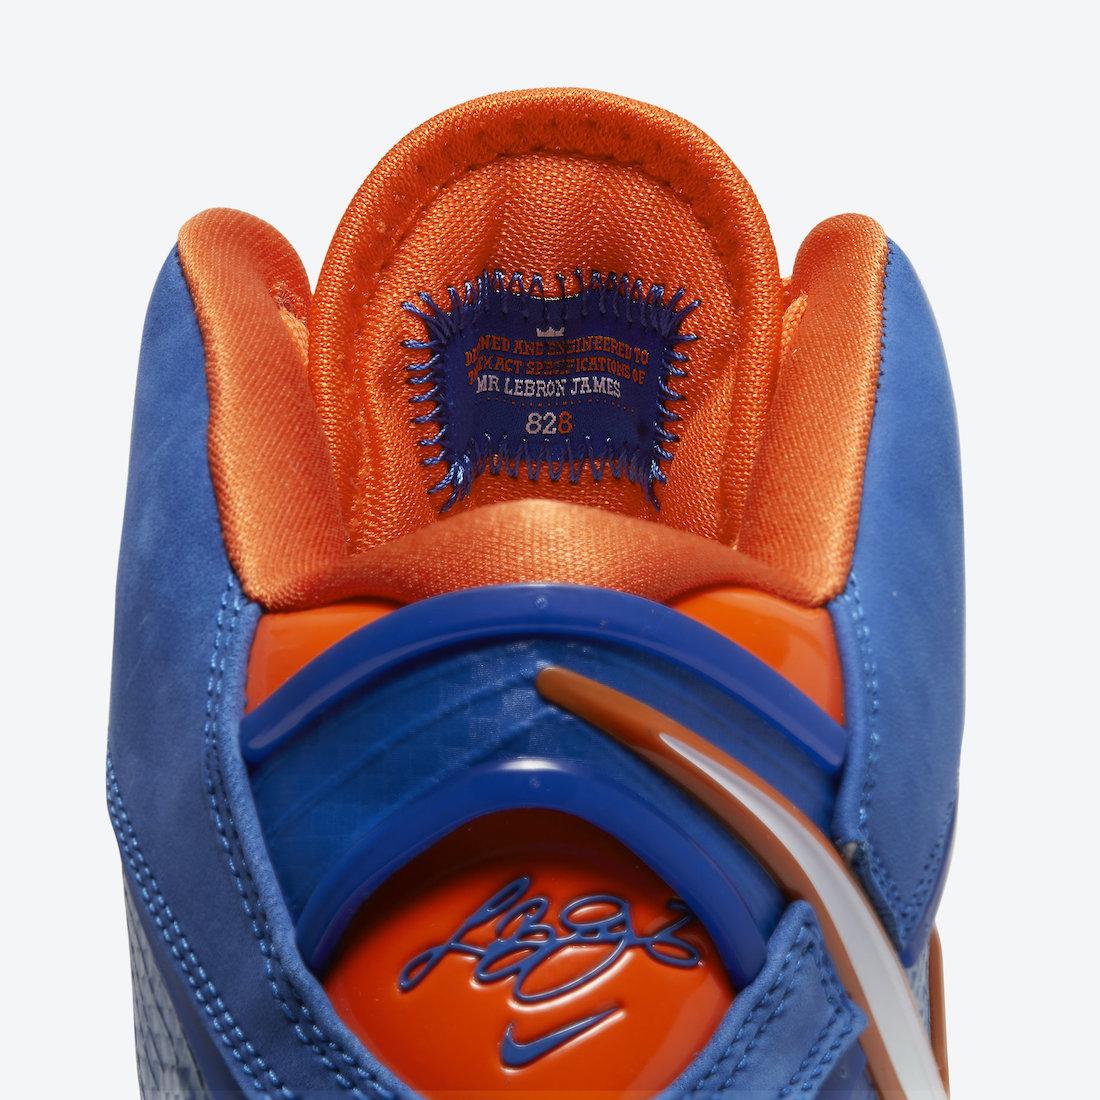 Nike-LeBron-8-HWC-Hardwood-Classic-CV1750-400-2021-Release-Date-Price-8